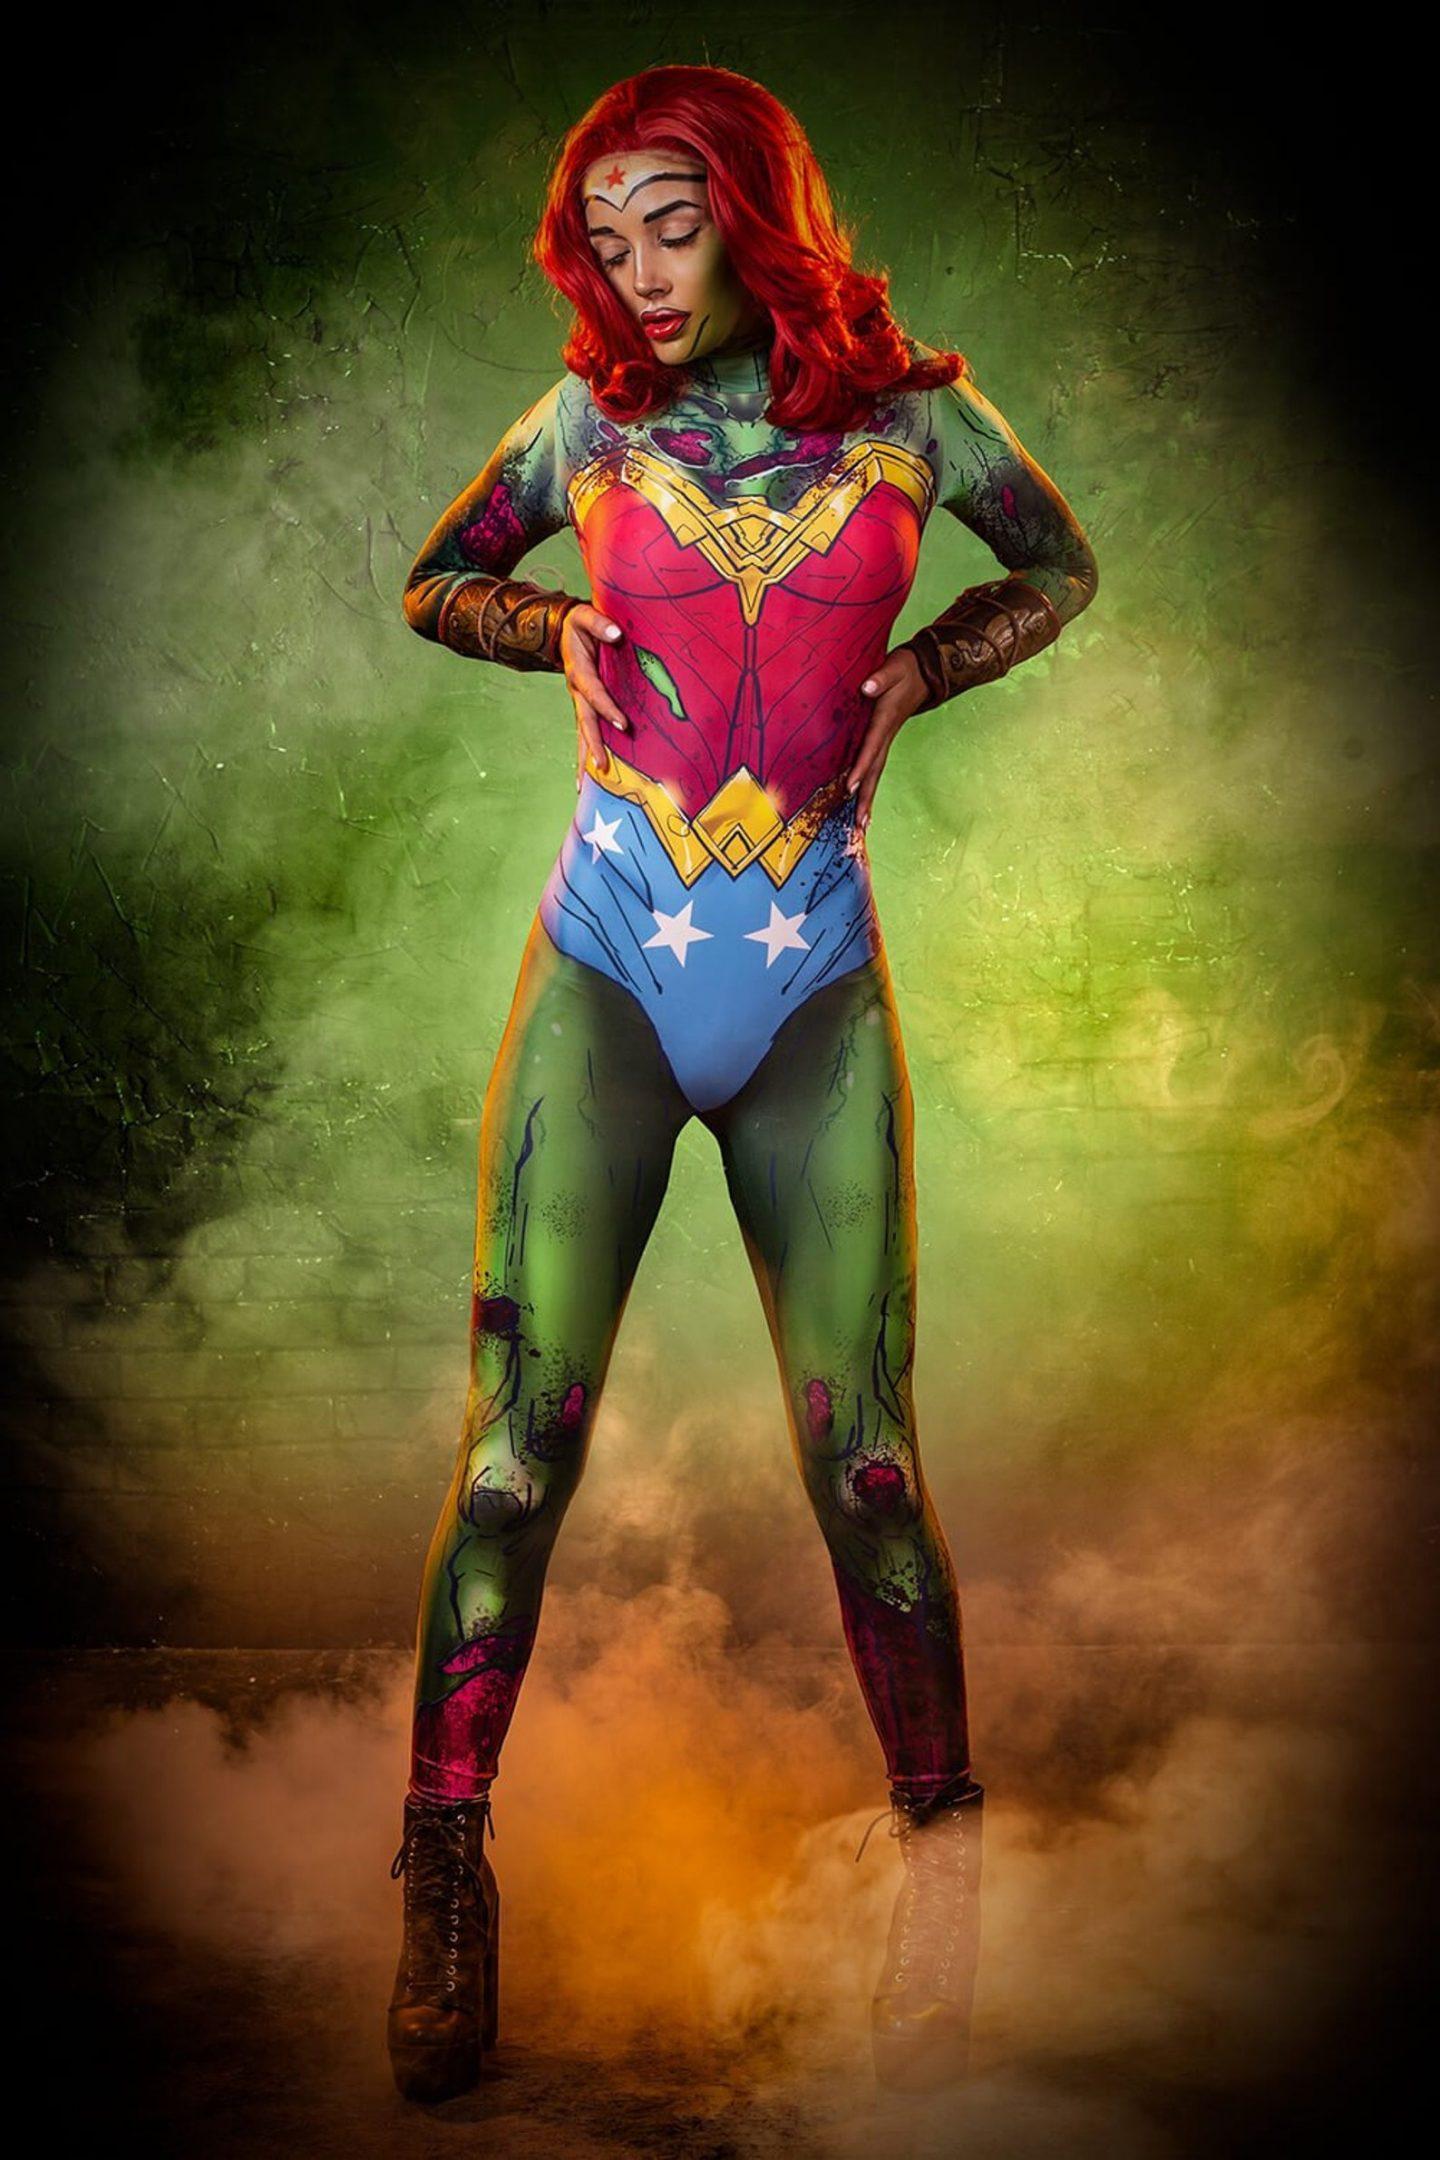 Zombie Wonder Woman Halloween costume for women